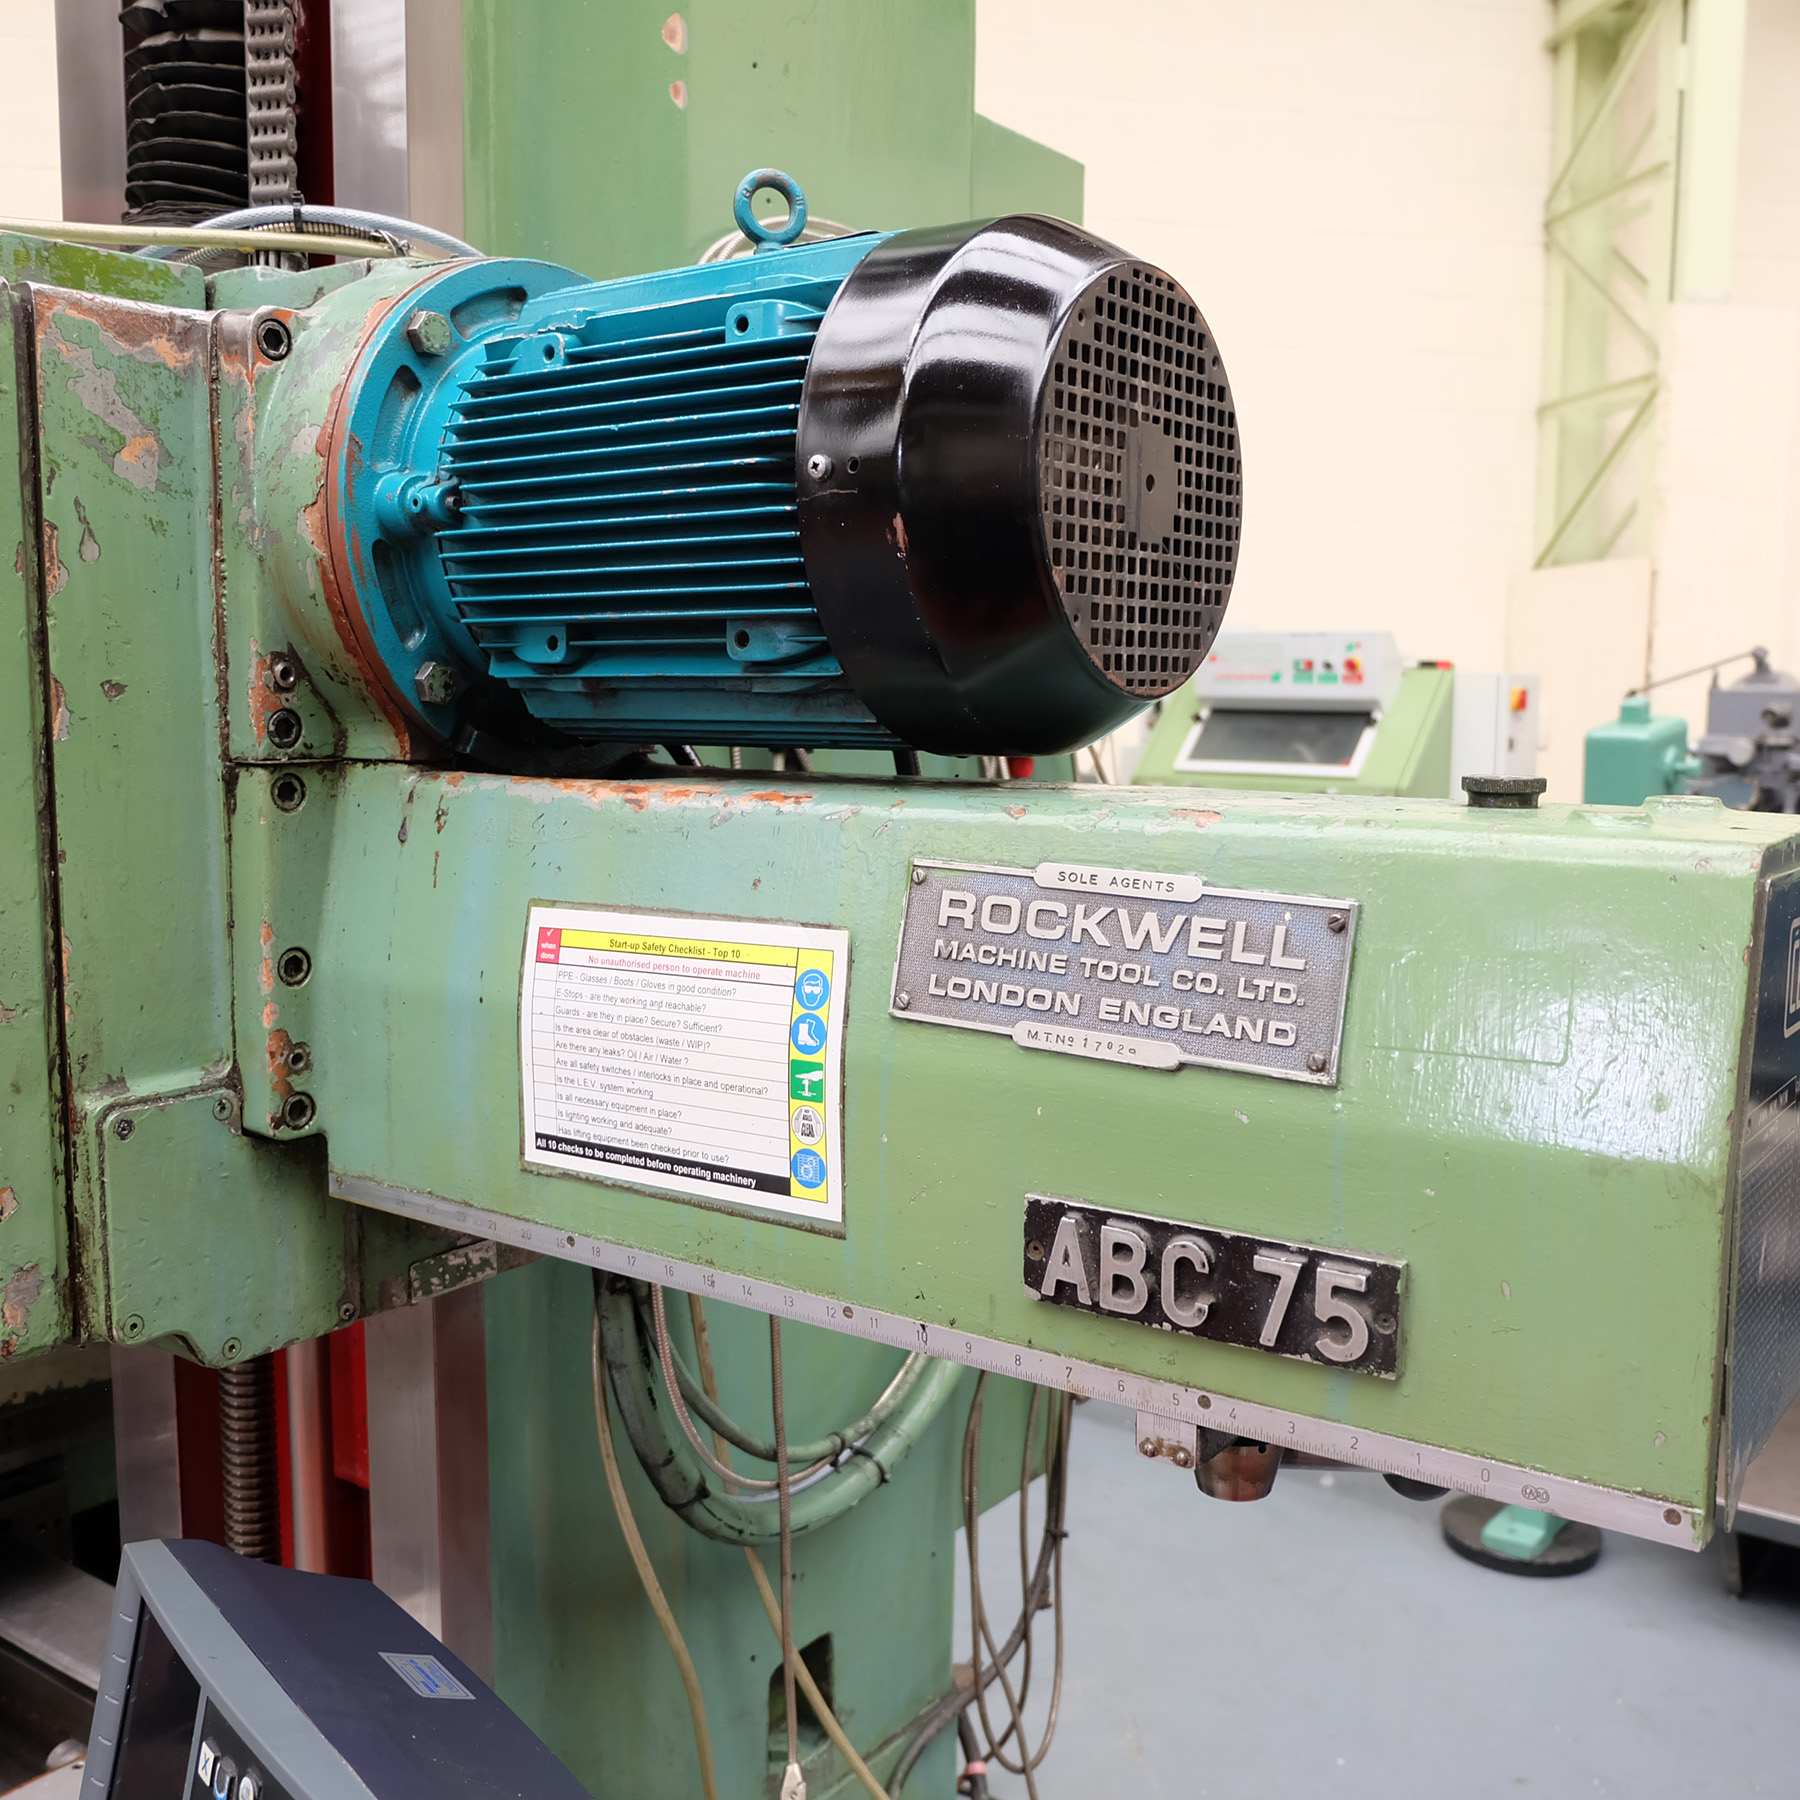 Ceruti Model ABC 75 Horizontal Boring & Milling Machine. With Tooling. - Image 12 of 15